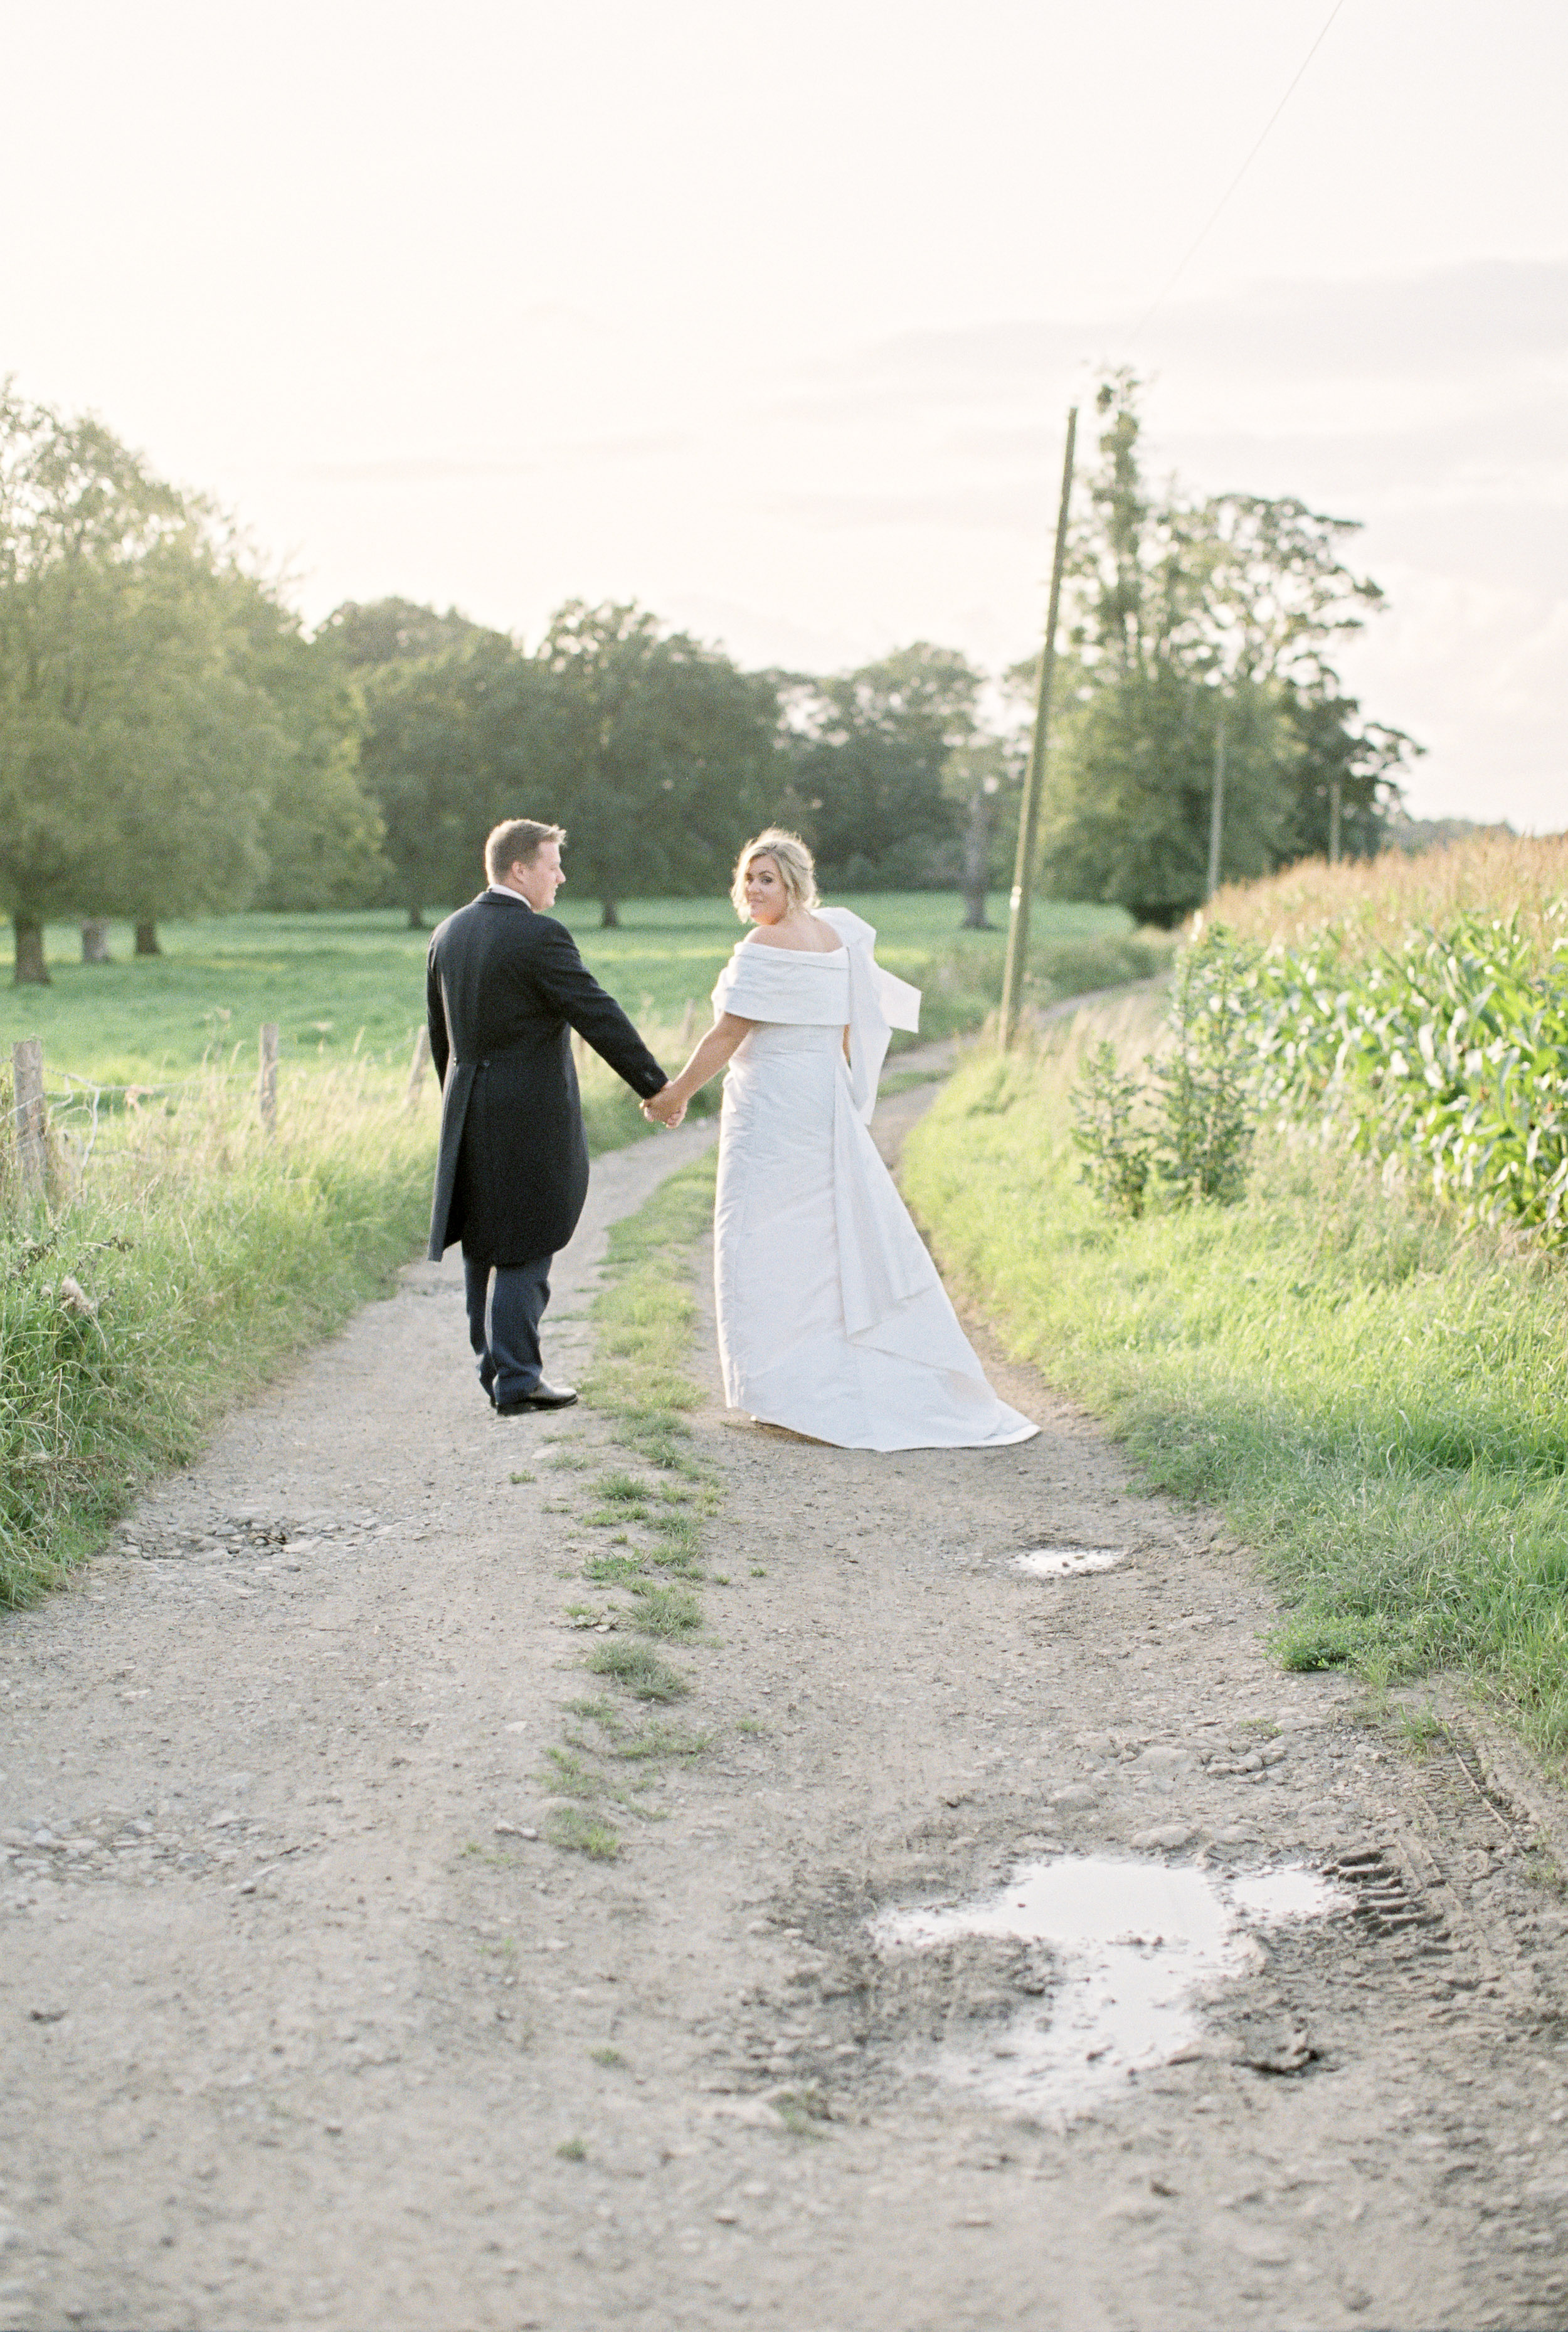 Liz Baker Fine Art Photography Emma Joy The Wedding Planner 5.jpg